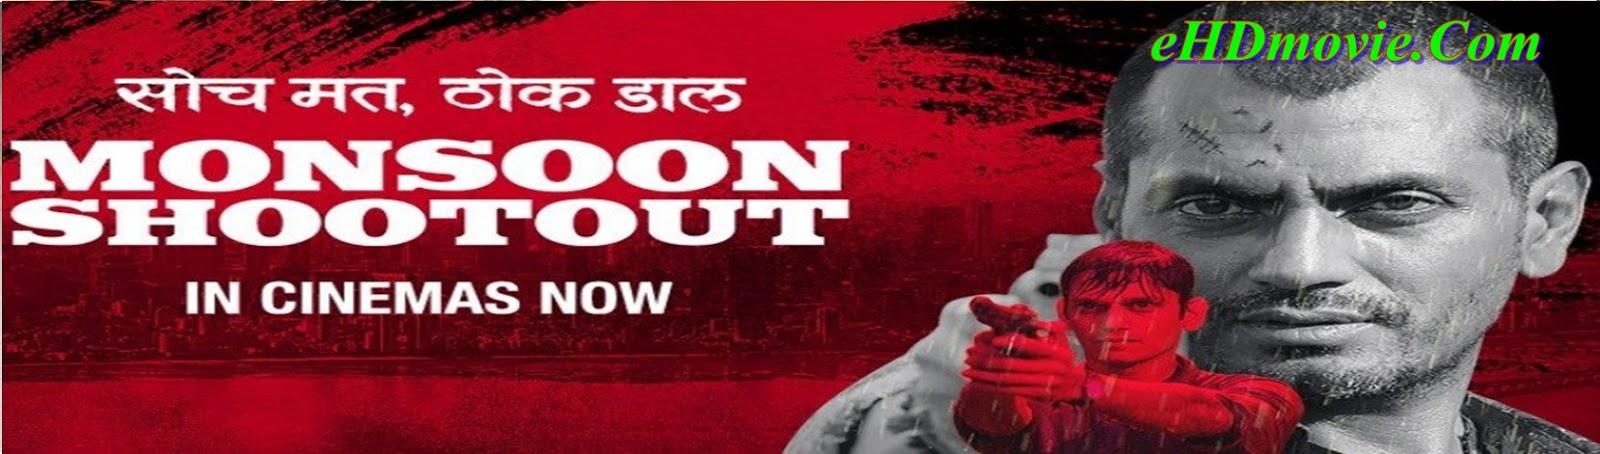 Monsoon Shootout 2013 Full Movie Hindi 720p - 480p ORG BRRip 400MB - 800MB ESubs Free Download